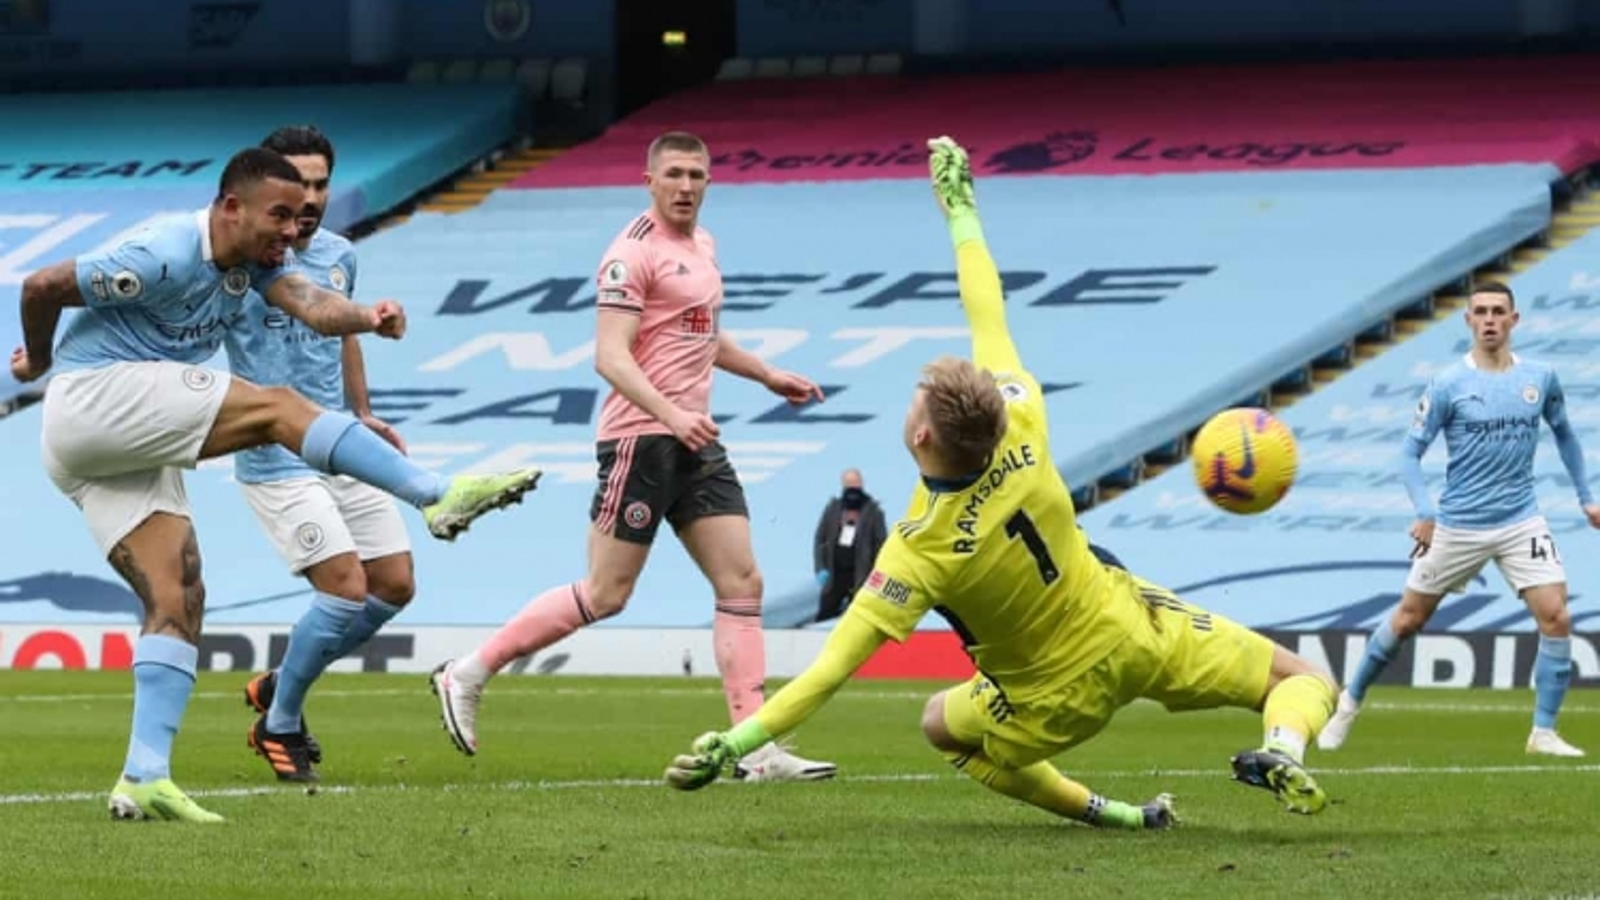 Thắng tối thiểu Sheffield, Man City tiếp tục dẫn đầu Premier League